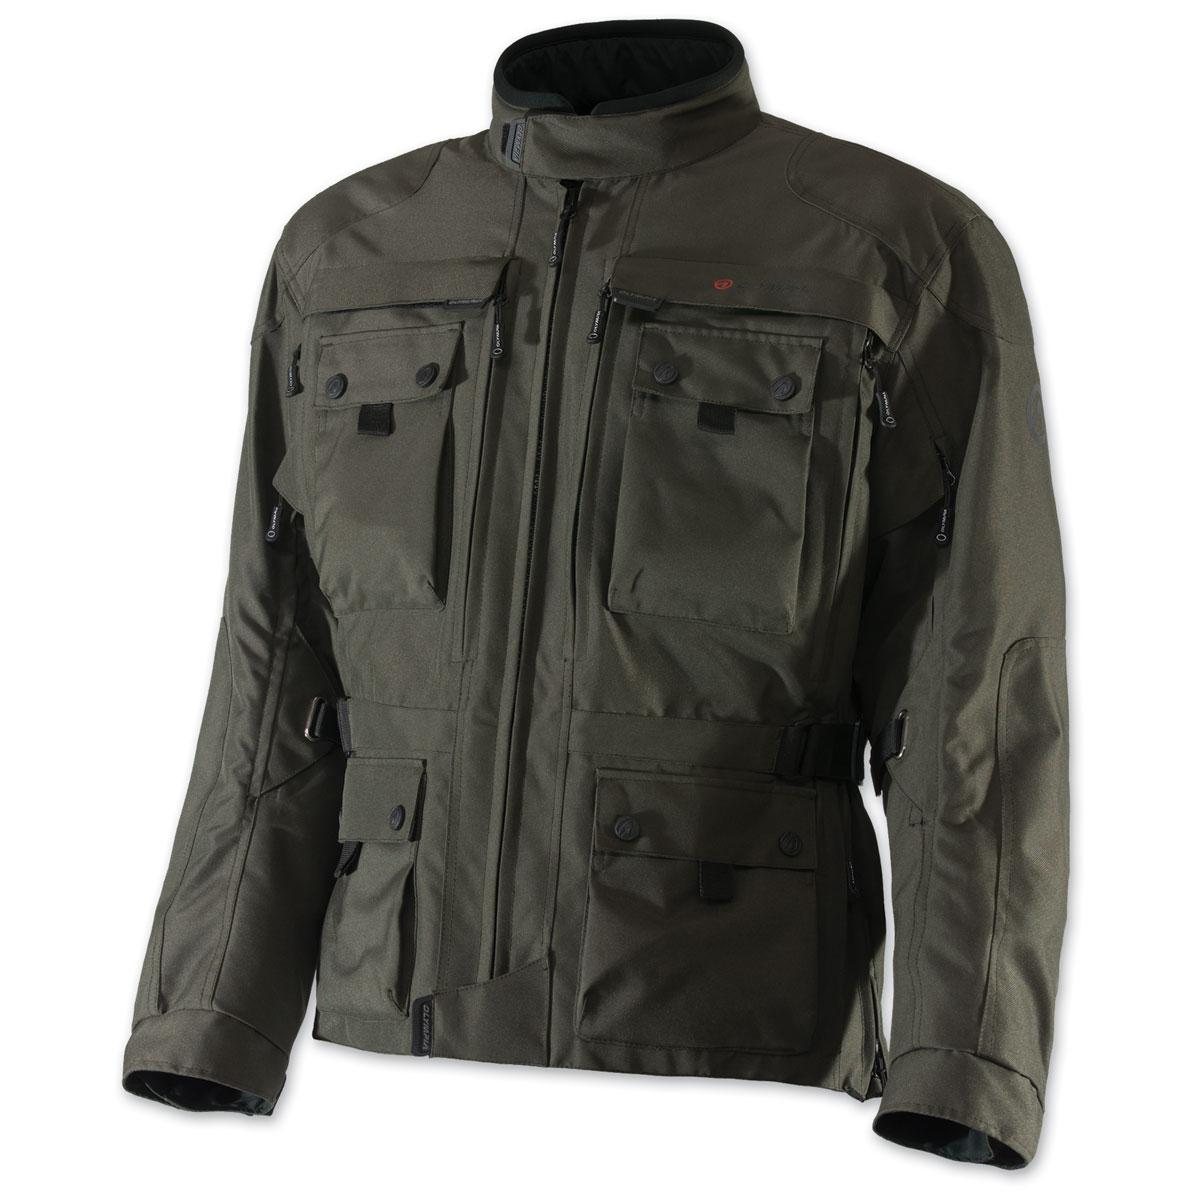 Olympia Moto Sports Men's Troy Transition Army Green Jacket